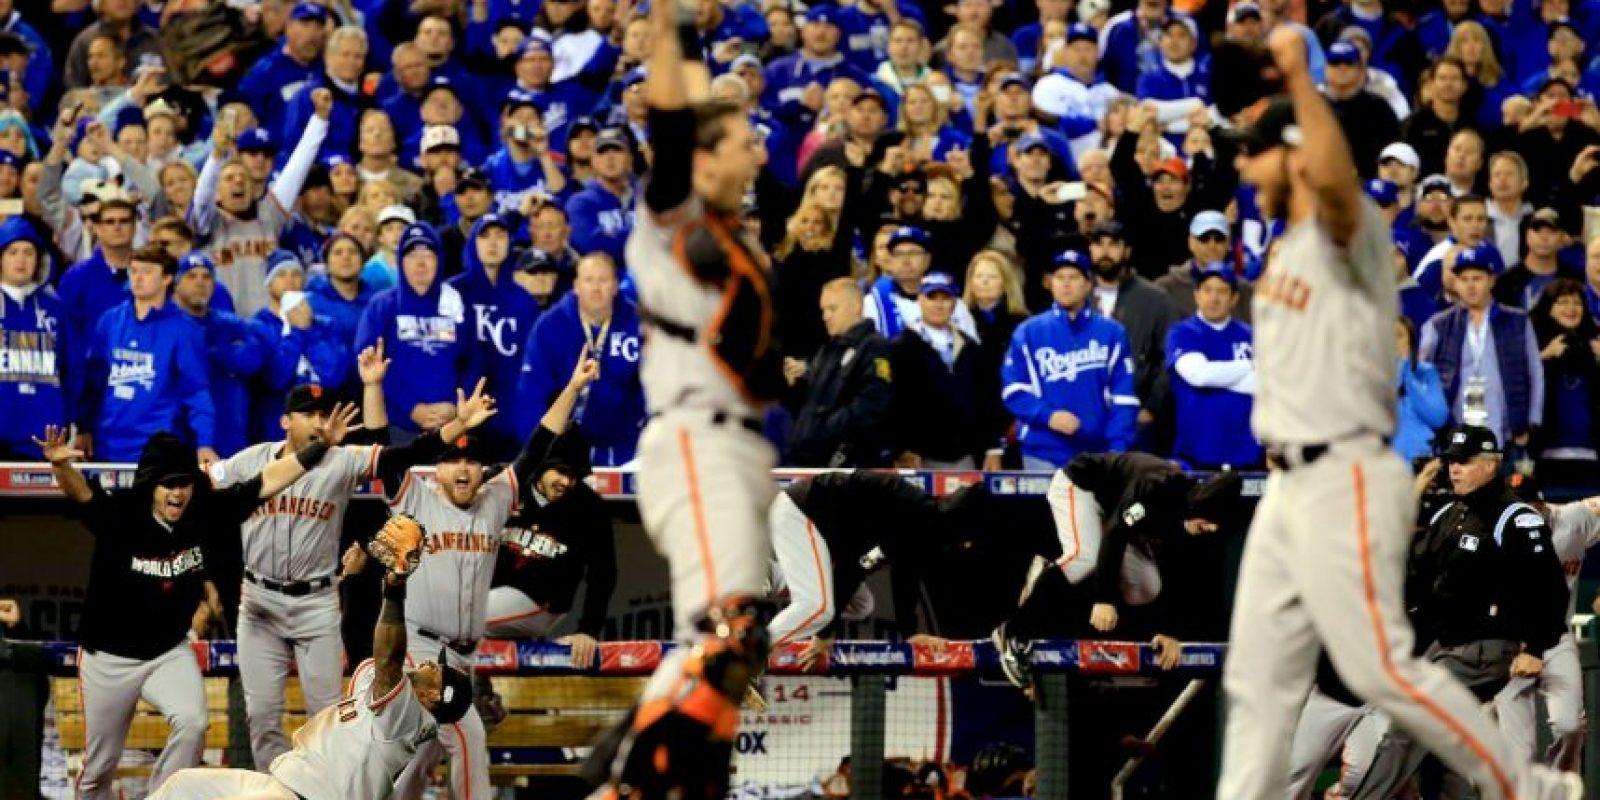 4. San Francisco Giants (Béisbol) Foto:Getty Images